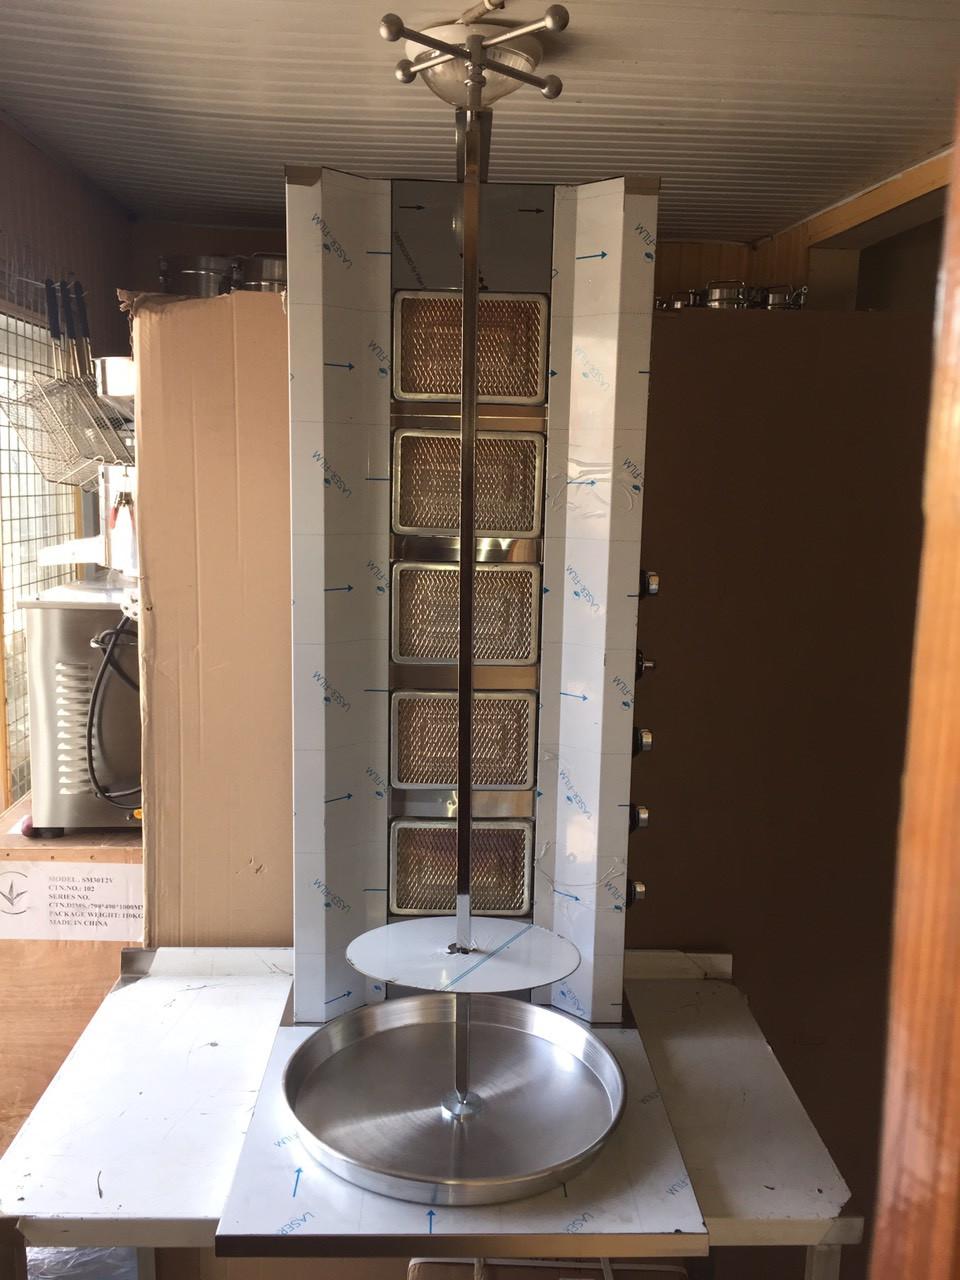 Görkem: Аппарат для шаурмы газовый Görkem GDO 50 LPG (5 горелок)